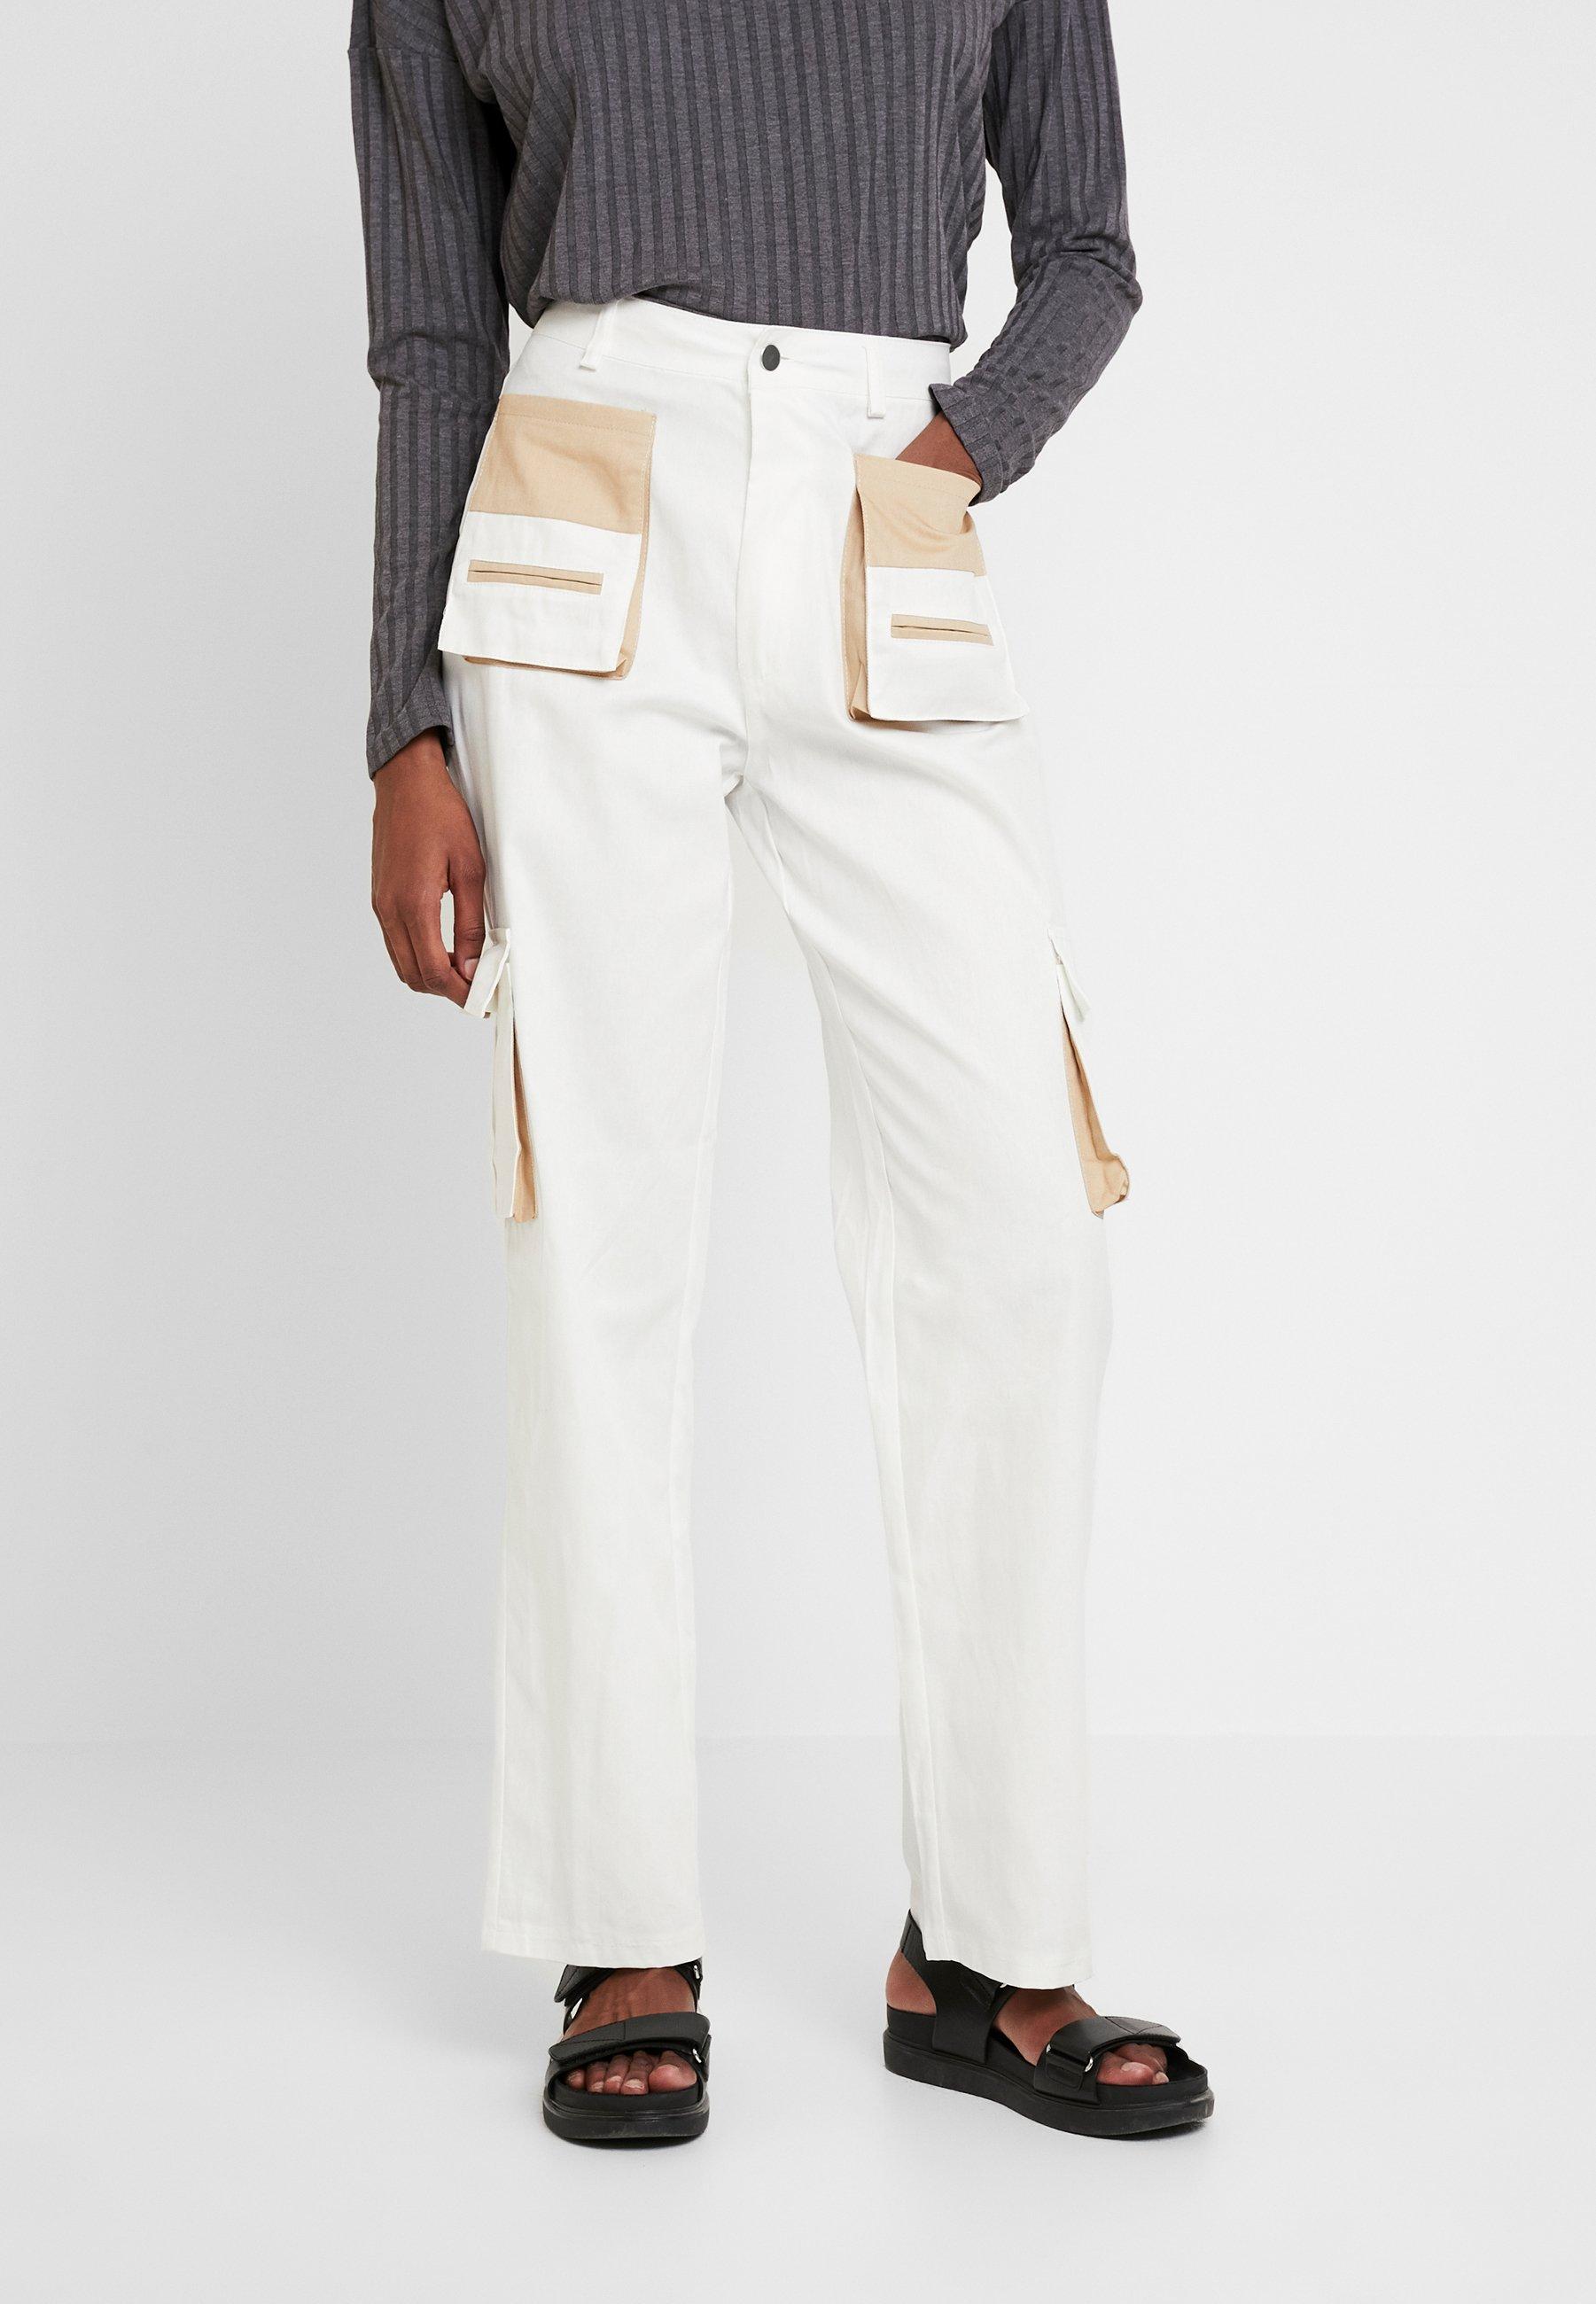 Tall Cream Contrast Cargo Missguided TrousersPantalon Classique Pocket CeBWEorQdx